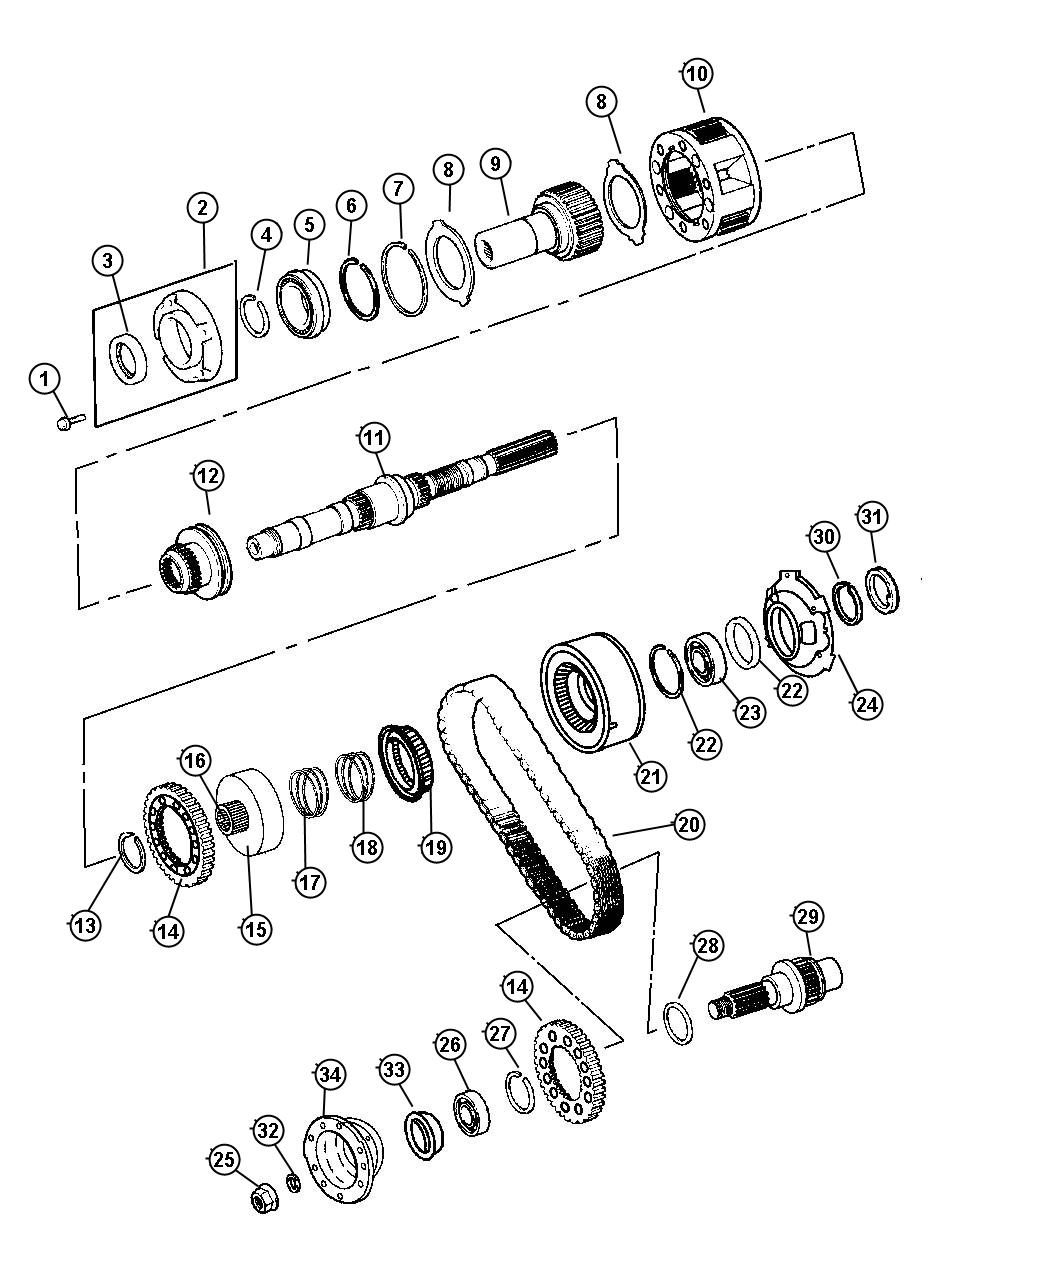 1999 Dodge Ram 3500 Chain. Transfer case. Trac, system